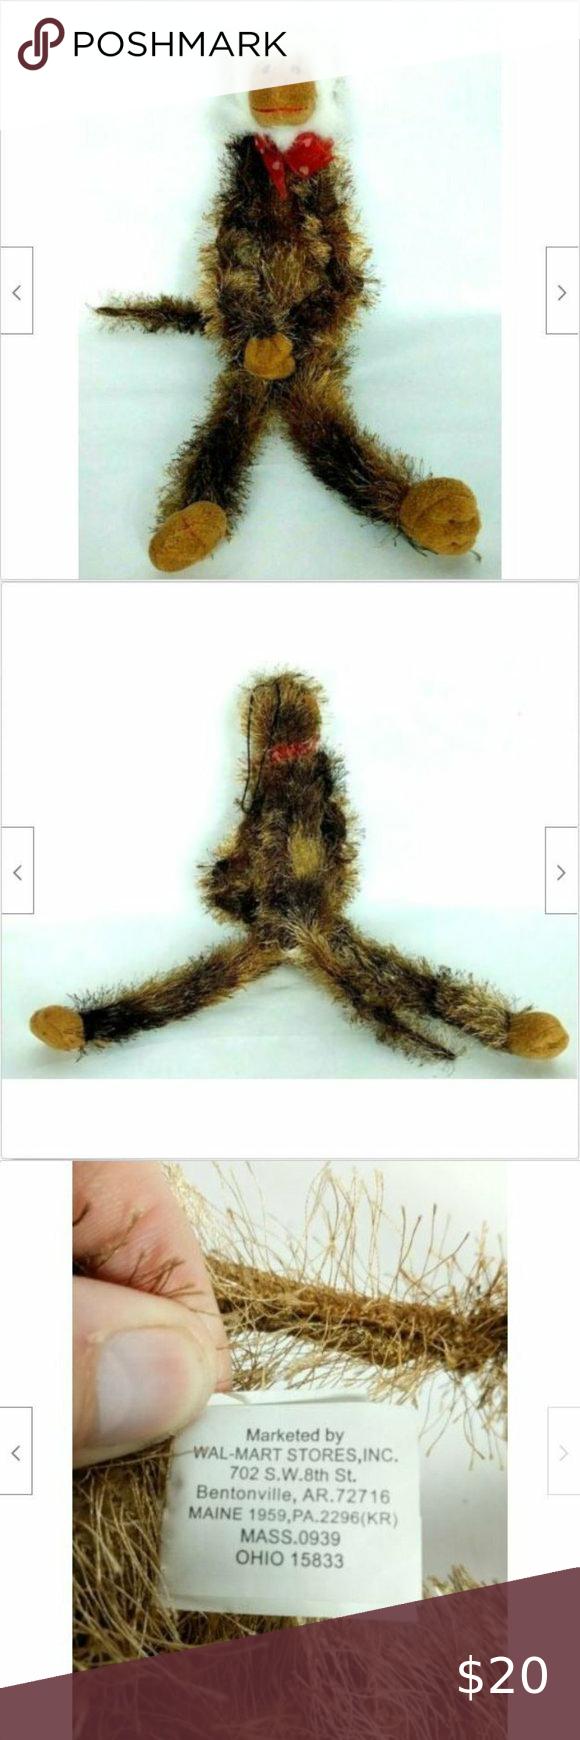 "Walmart Valentine Monkey Plush with Bow 20"""